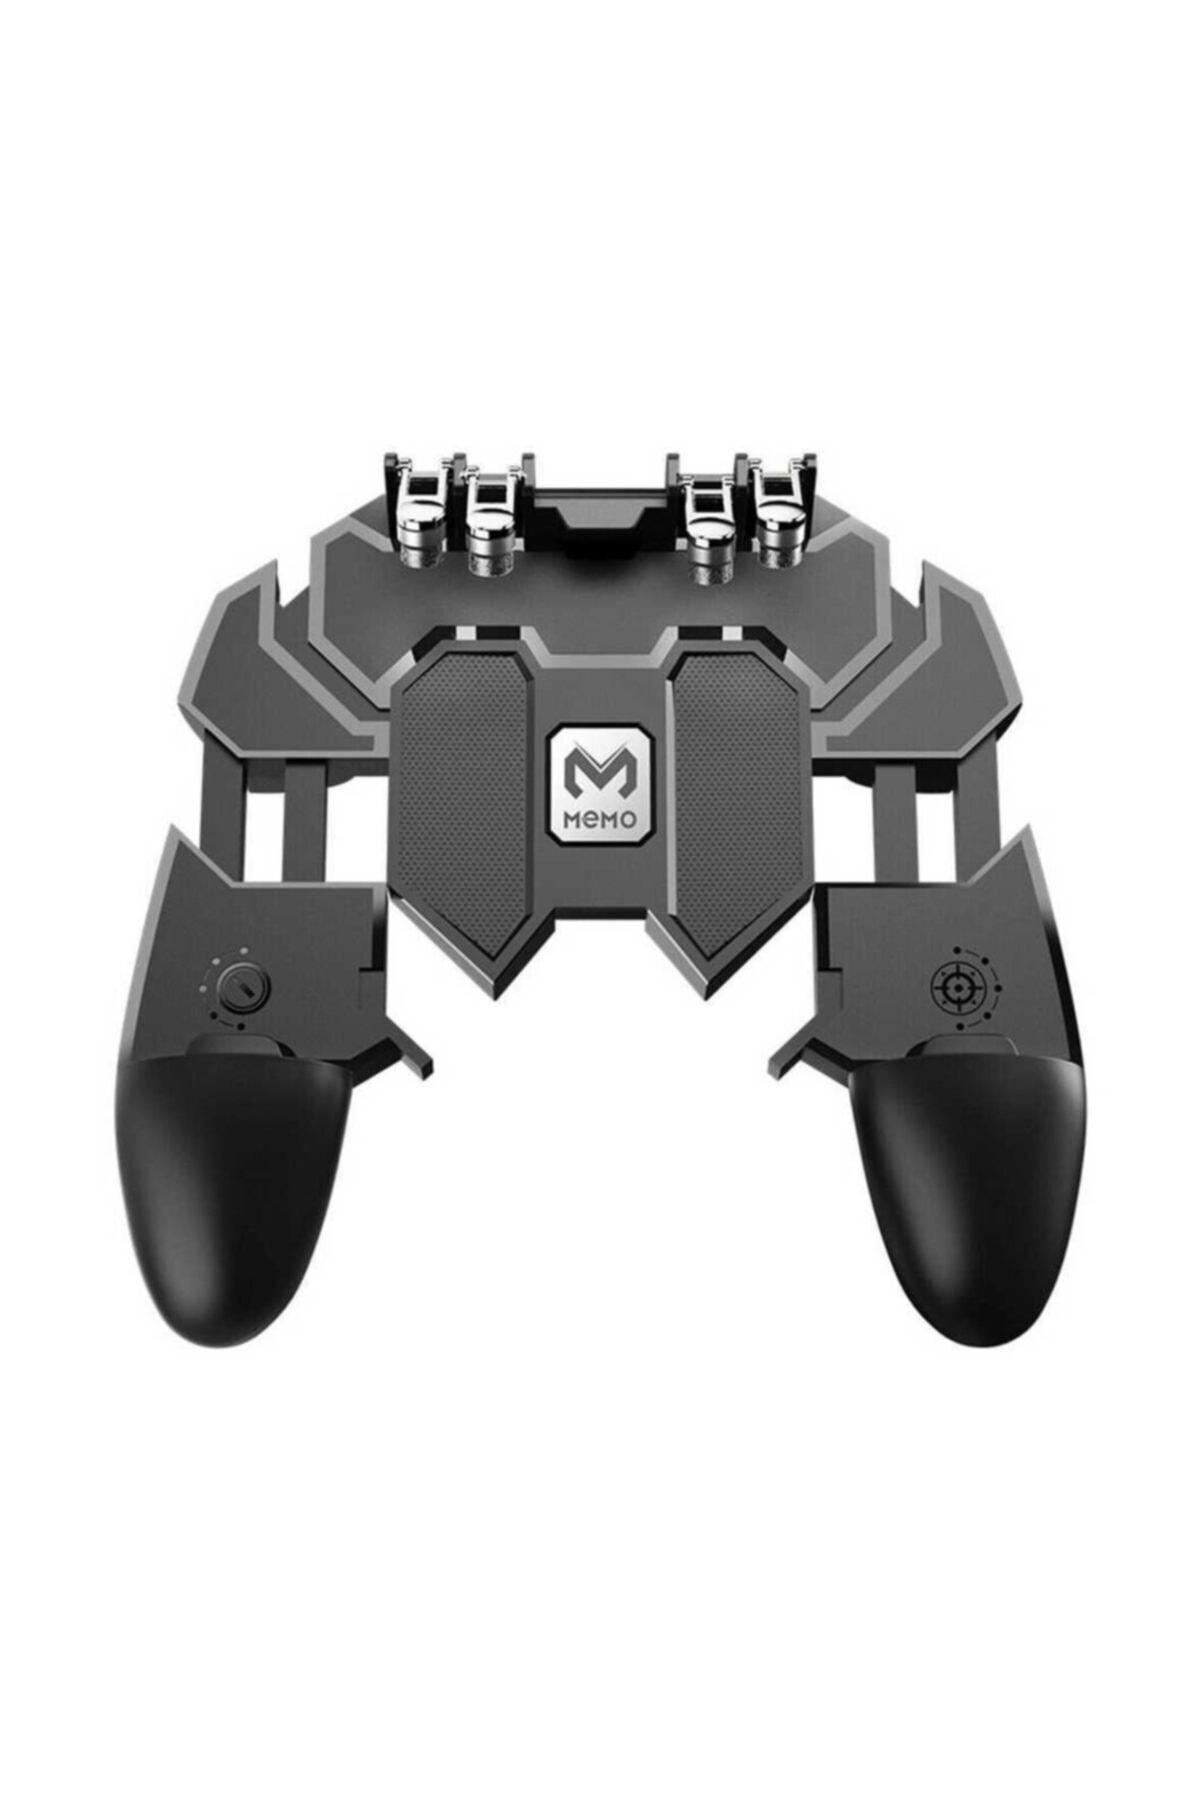 Kılıfist ??zore Ak-66 Mobil Game 4 Tetikli Pubg Oyun Konsol Aparatı Fiyatı,  Yorumları - Trendyol